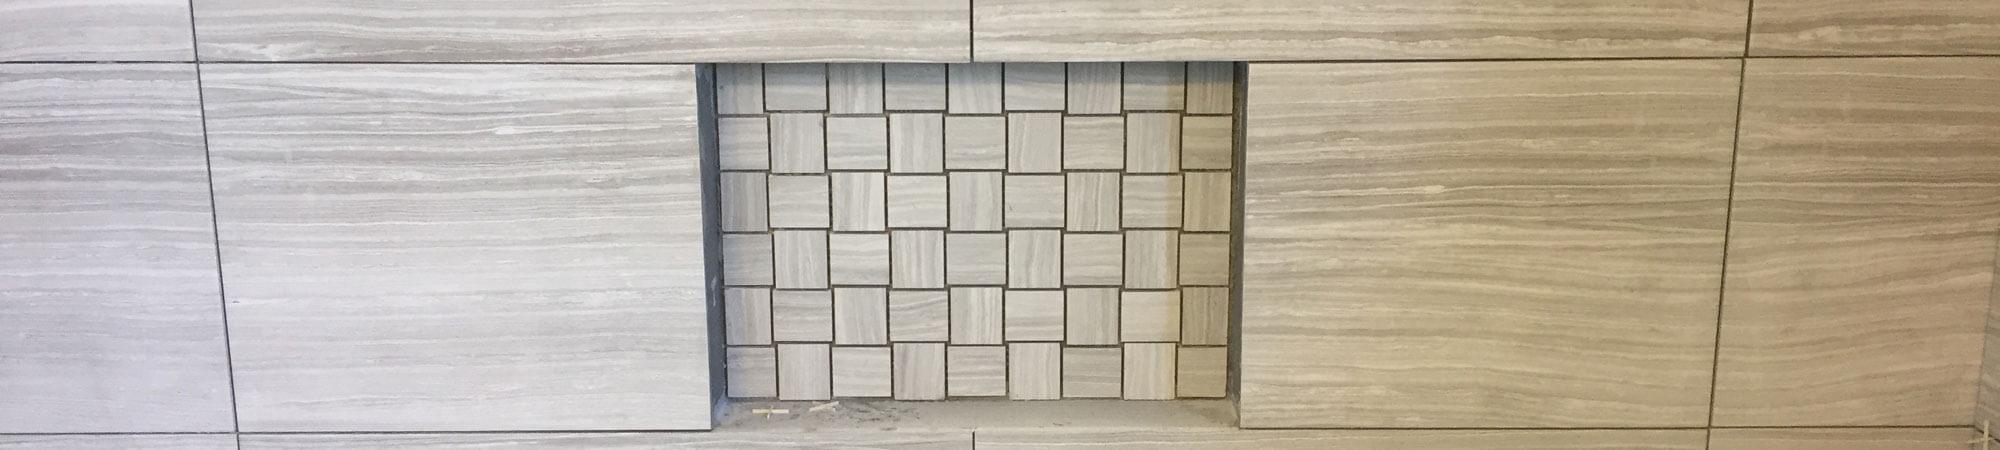 Shower Tile with Soap Shelf